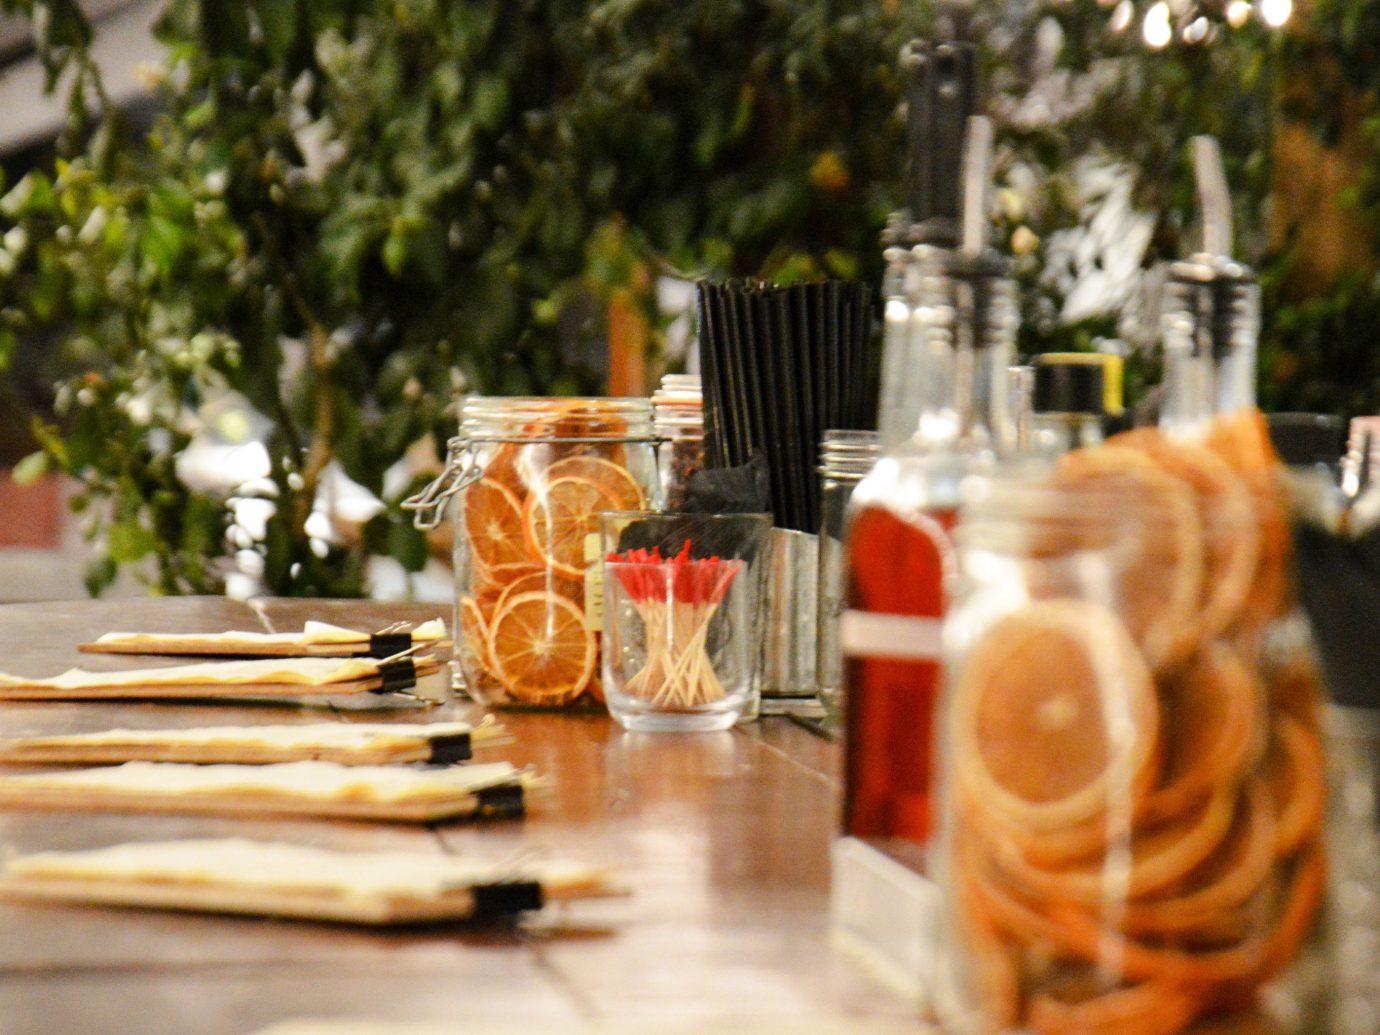 Food + Drink Paris Trip Ideas table tree brunch Drink food orange breakfast cuisine meal dish dining table